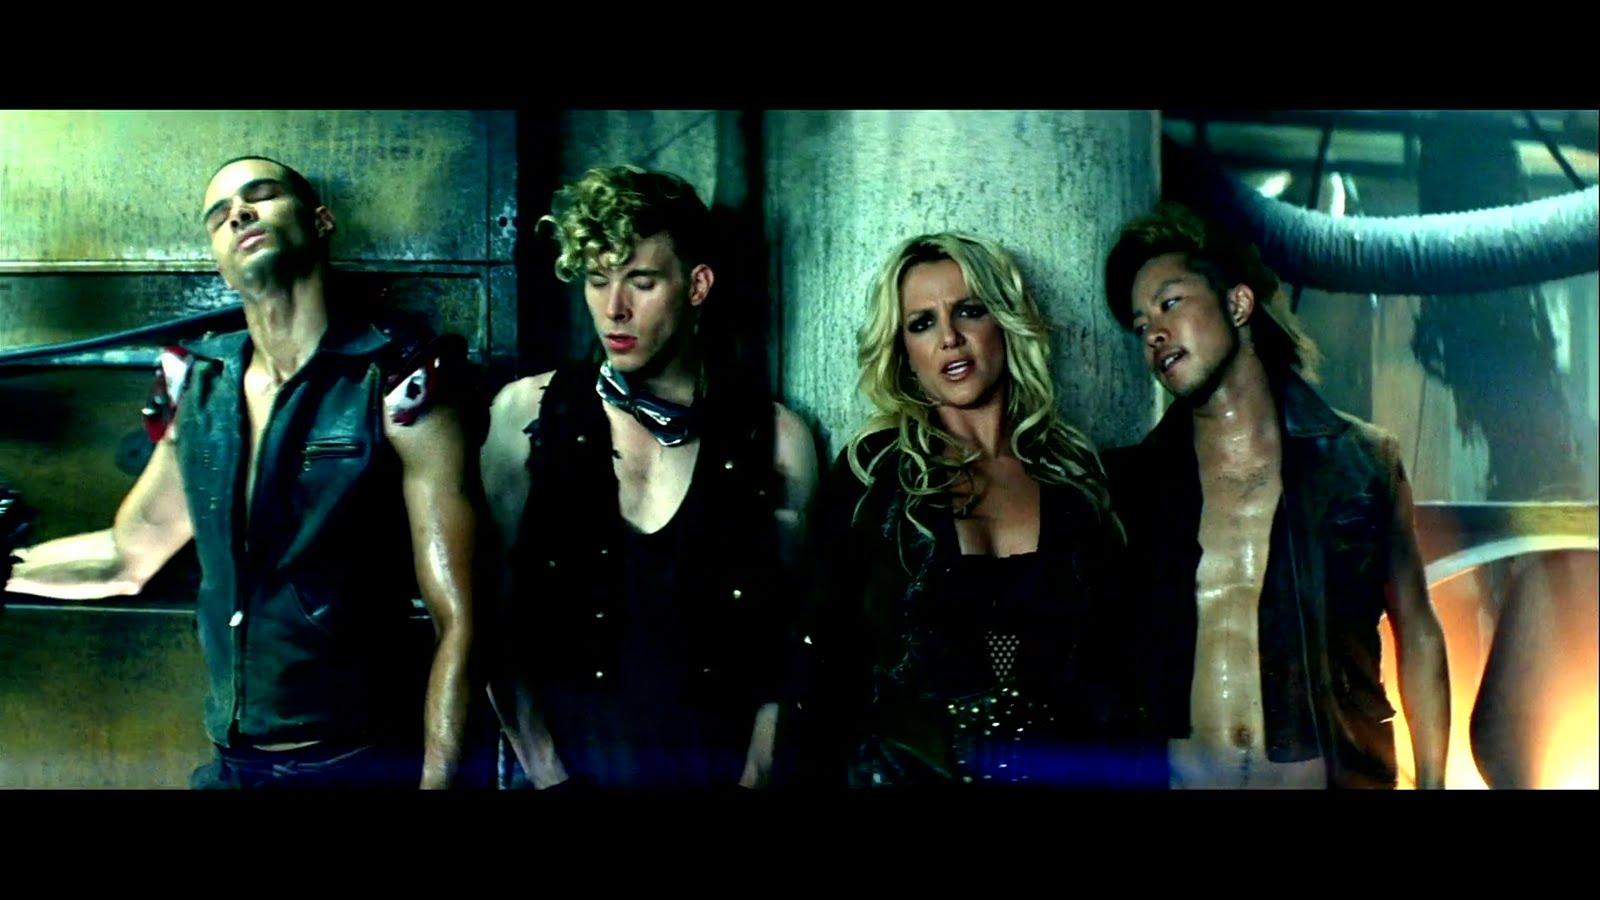 http://2.bp.blogspot.com/-v_IiBoEqids/TaxKSr1dvXI/AAAAAAAAAgU/2-rgWlplvmY/s1600/Britney%2BSpears%2B-%2B%2BTill%2BThe%2BWorld%2BEnds%2B%2528%2BDance%2BVersion%2B%2529%2B19.jpg